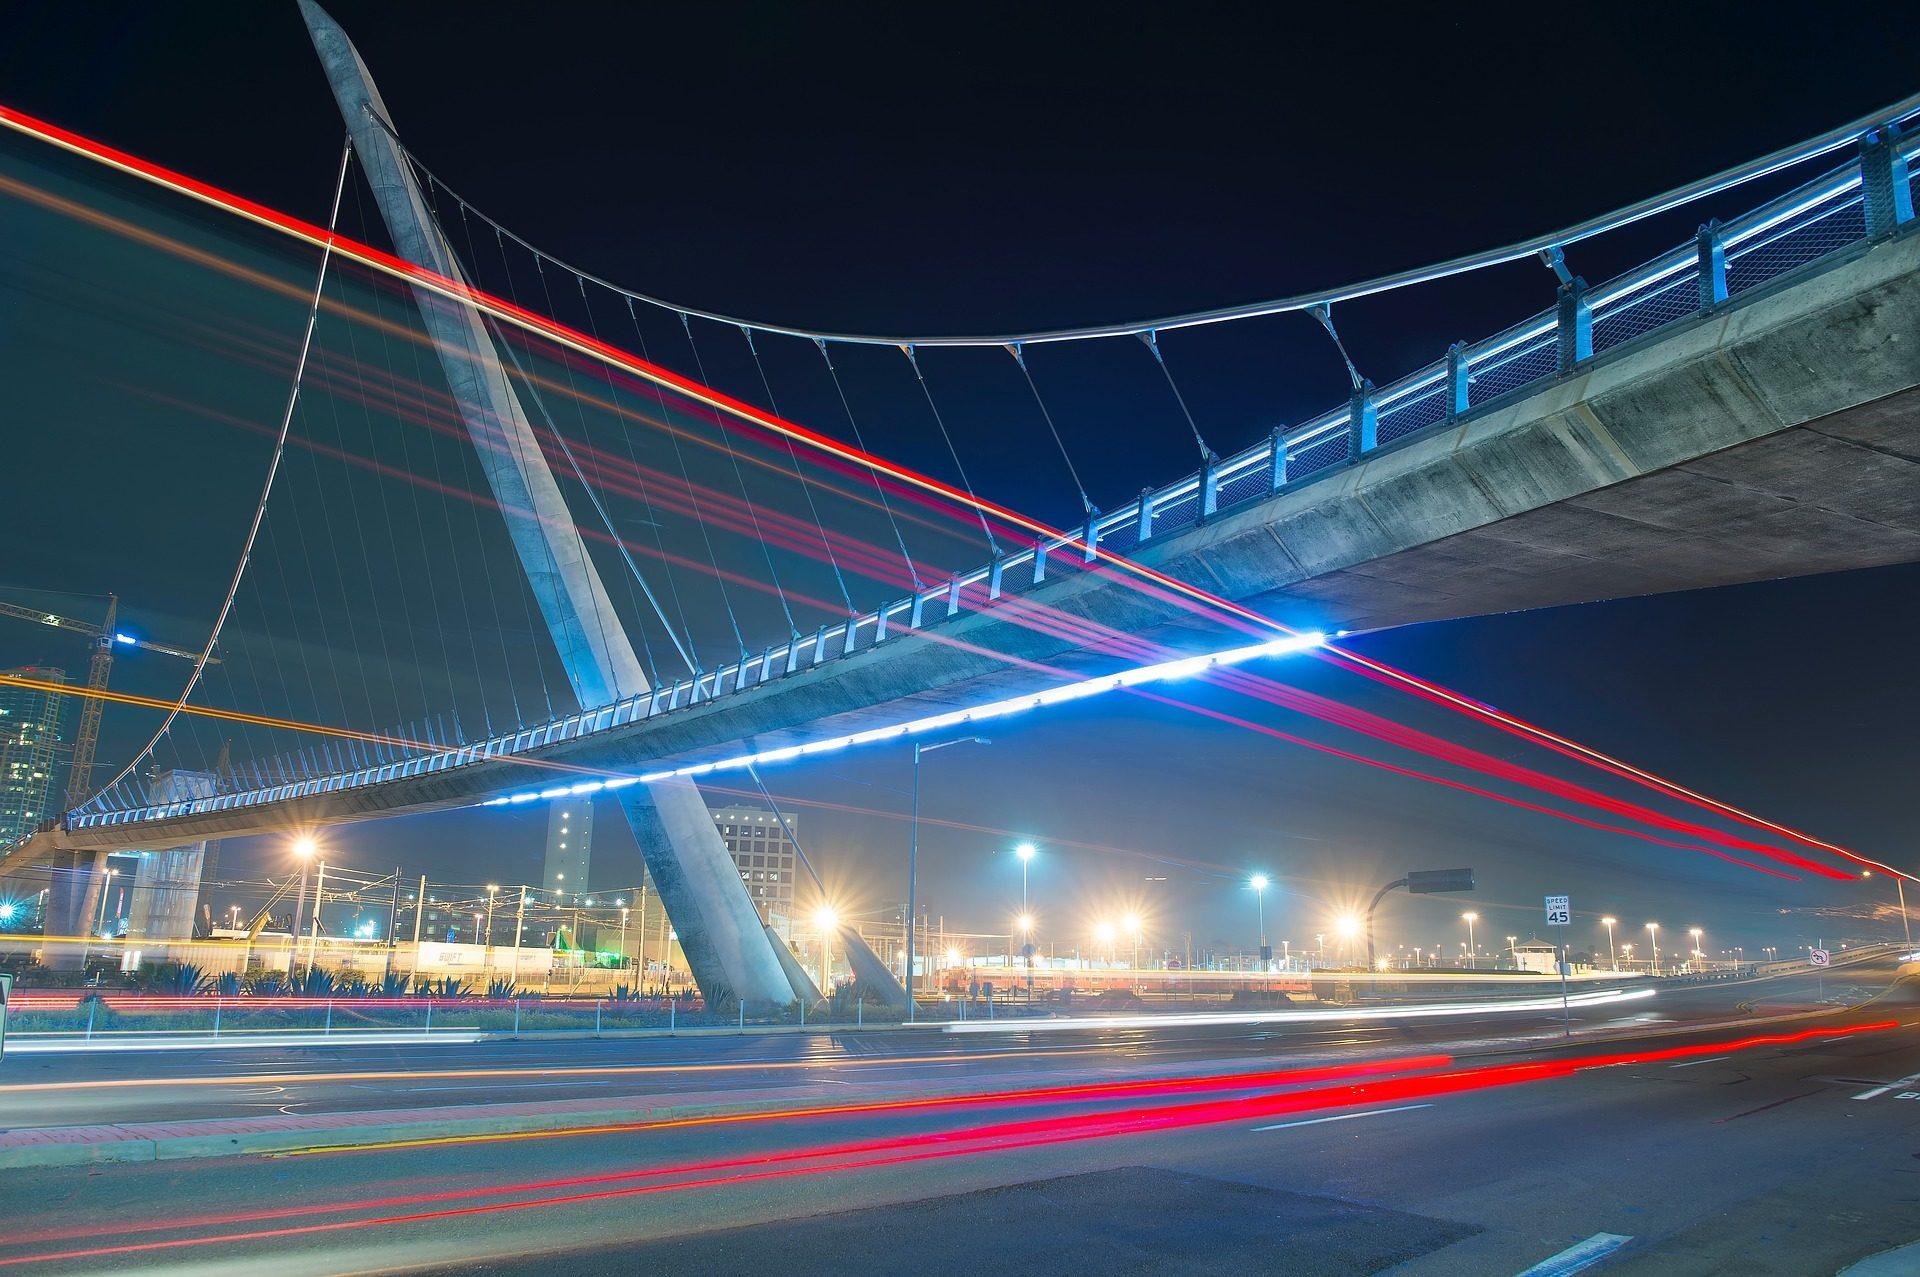 Ponte, luces, Città, luci, aloni, notte - Sfondi HD - Professor-falken.com